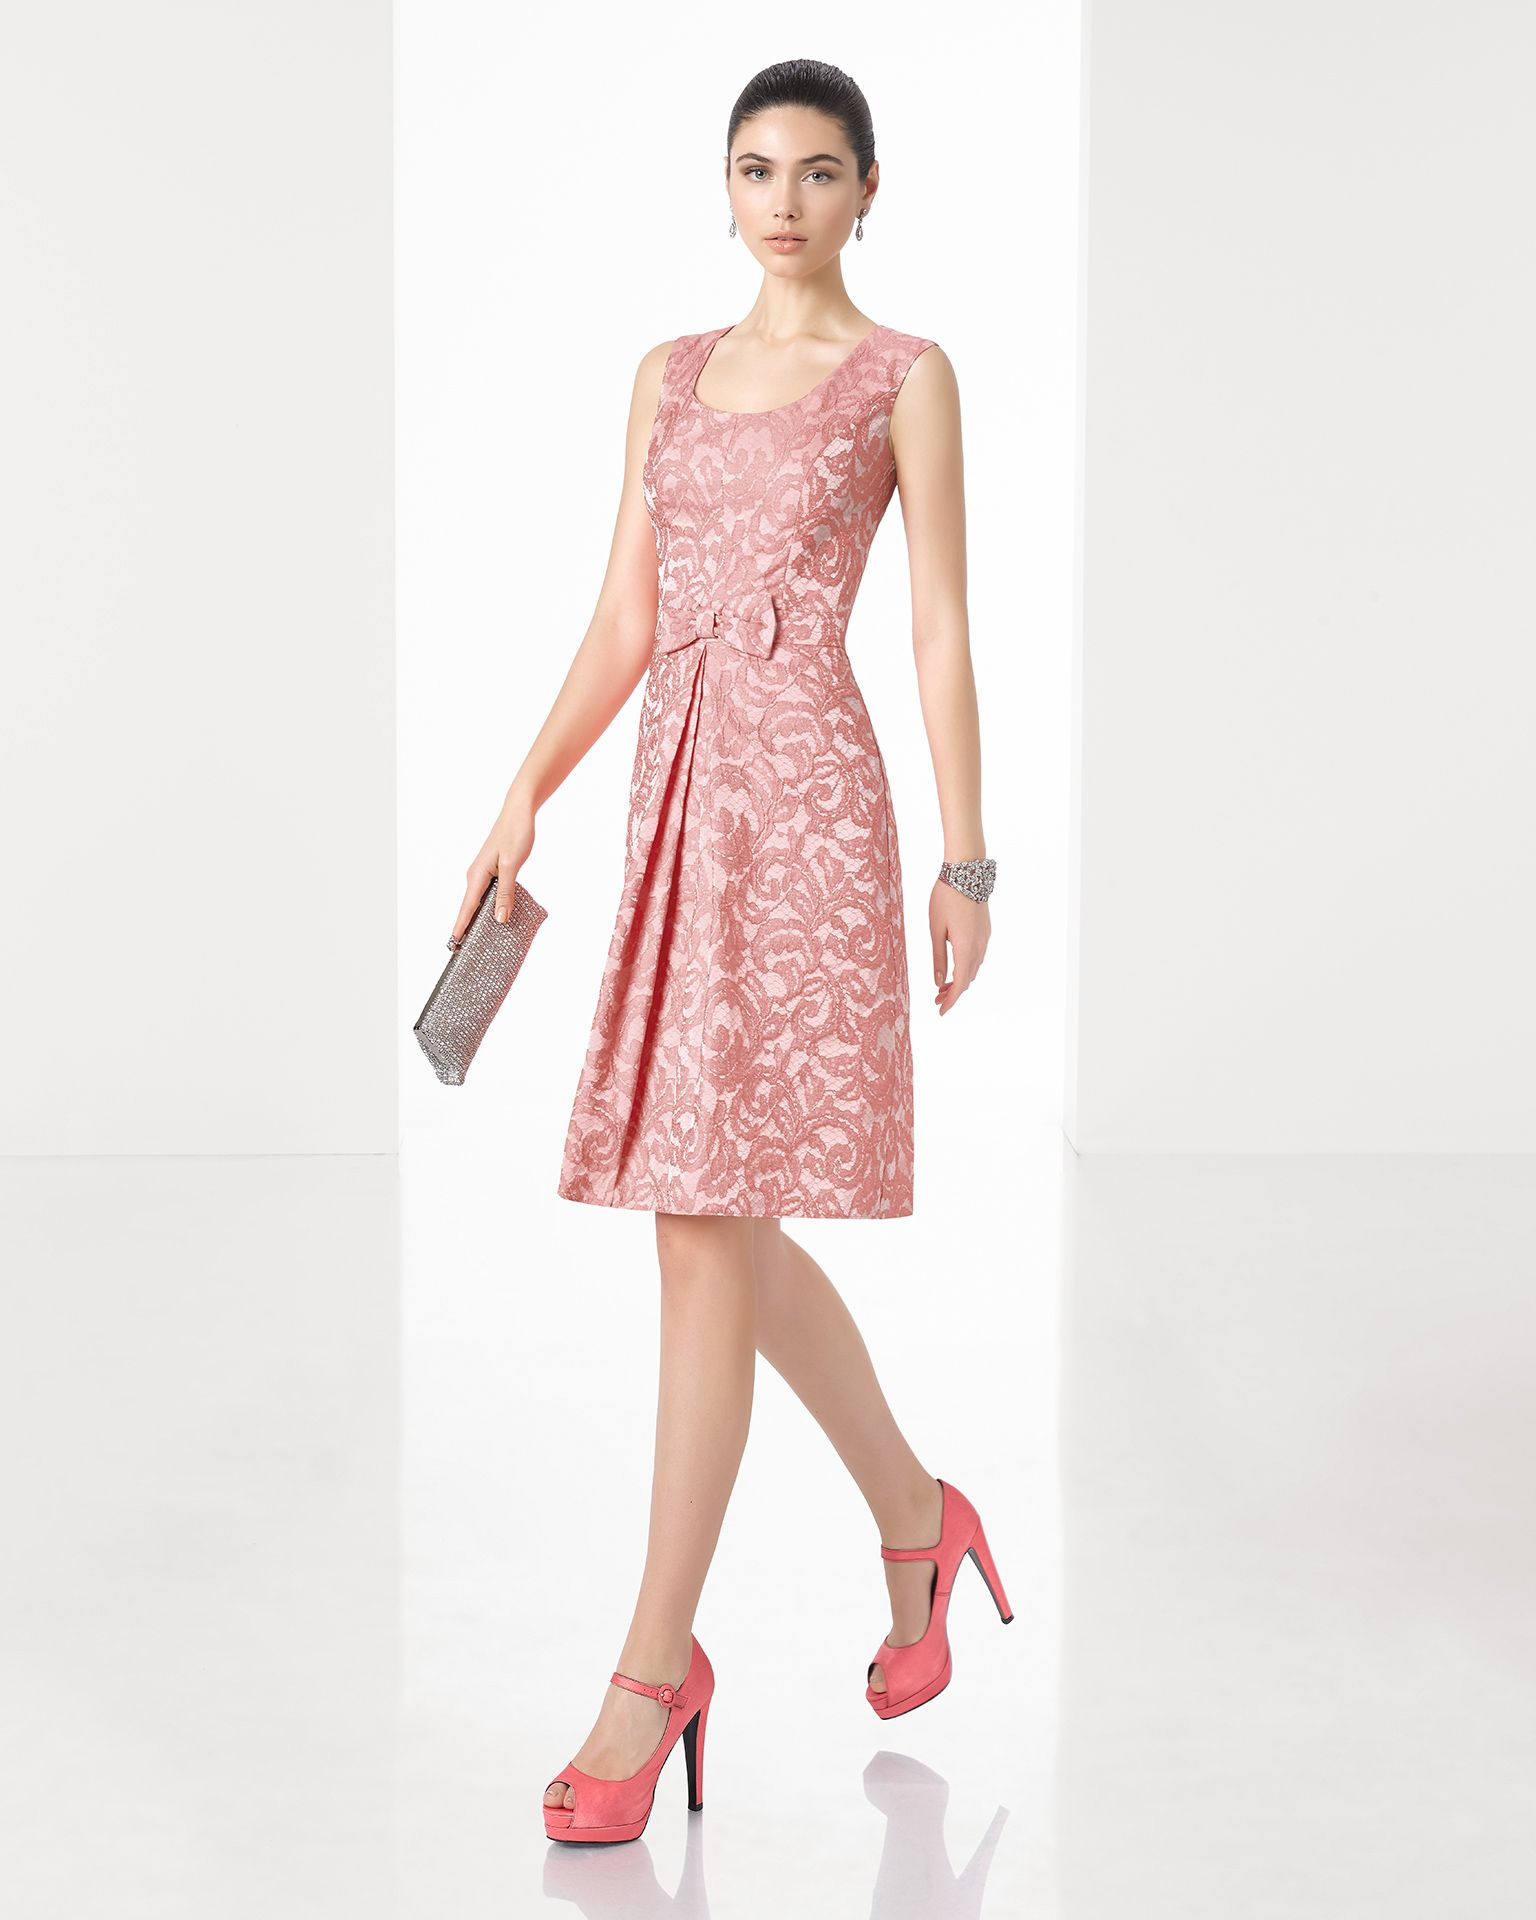 1T1E6 | fashion by نورة ام احمد | Pinterest | Rosa clará, Vestidos ...